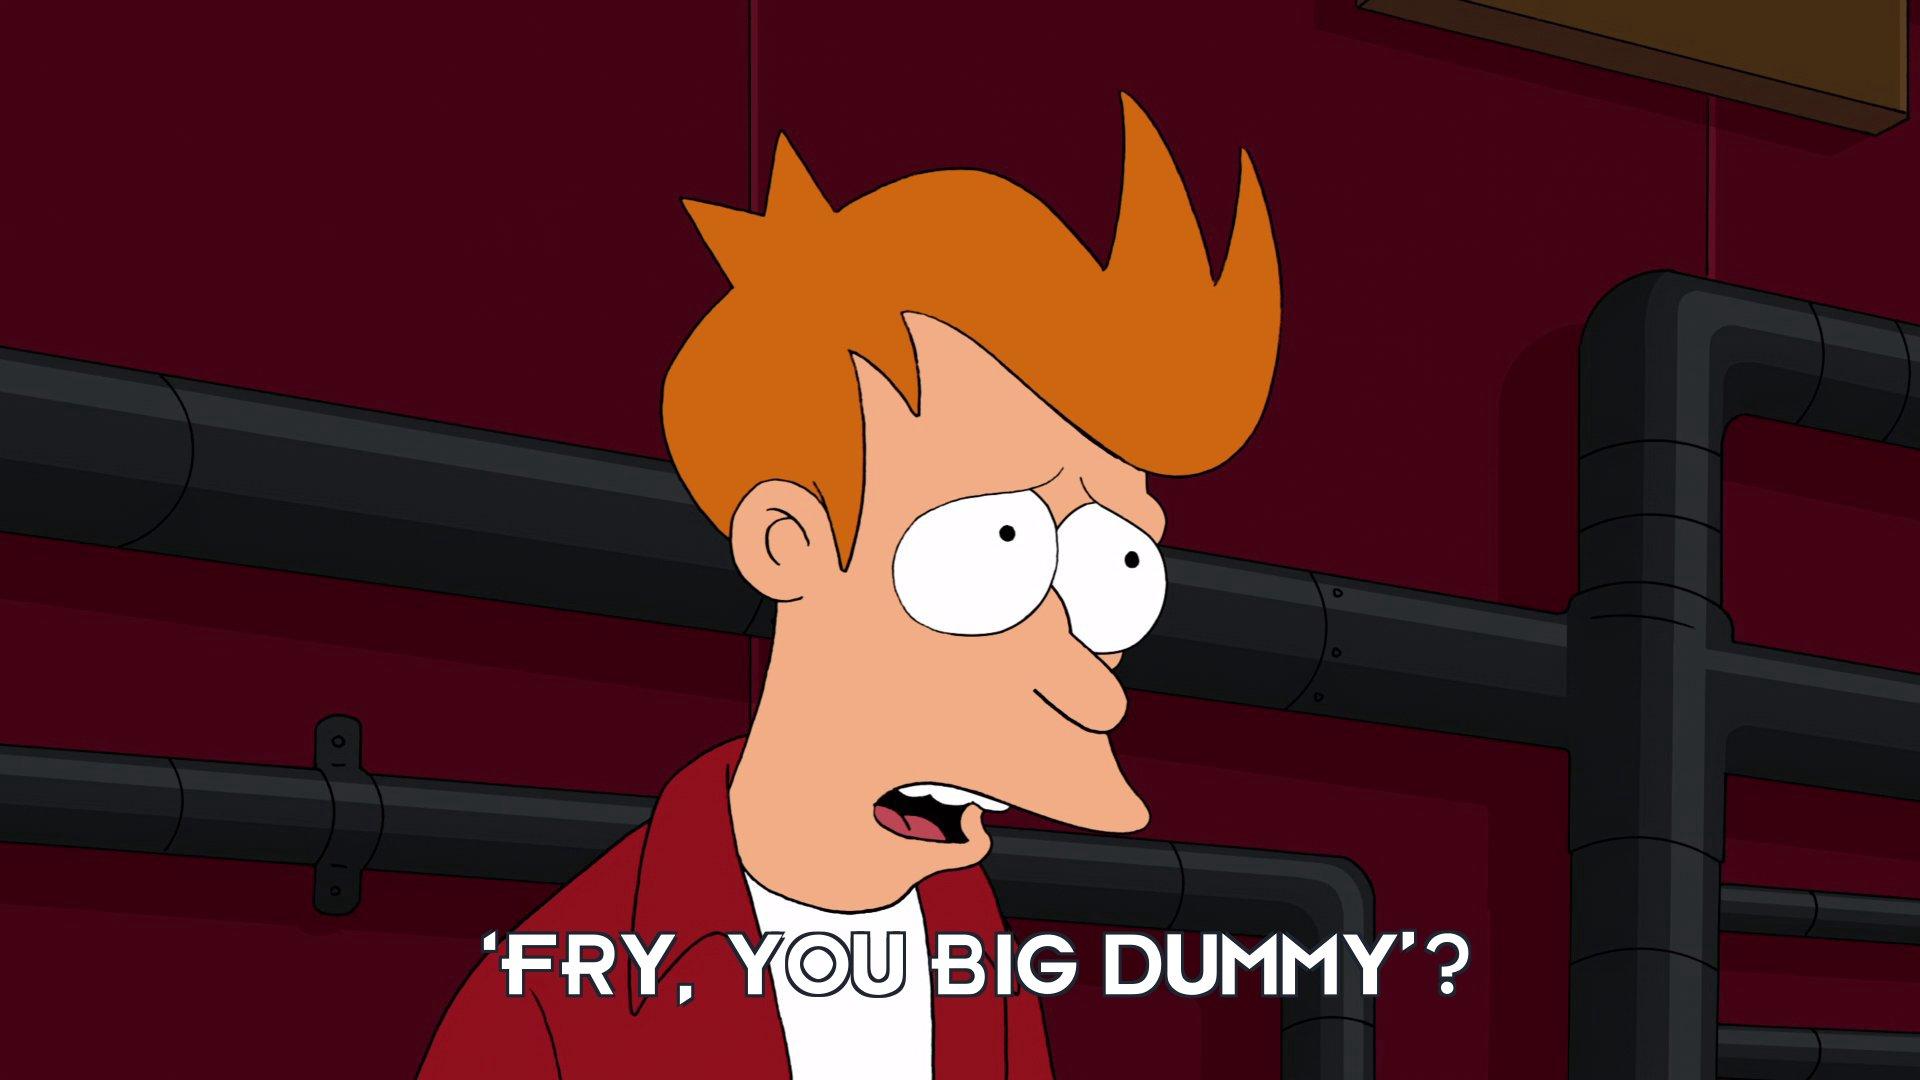 Philip J Fry: 'Fry, you big dummy'?